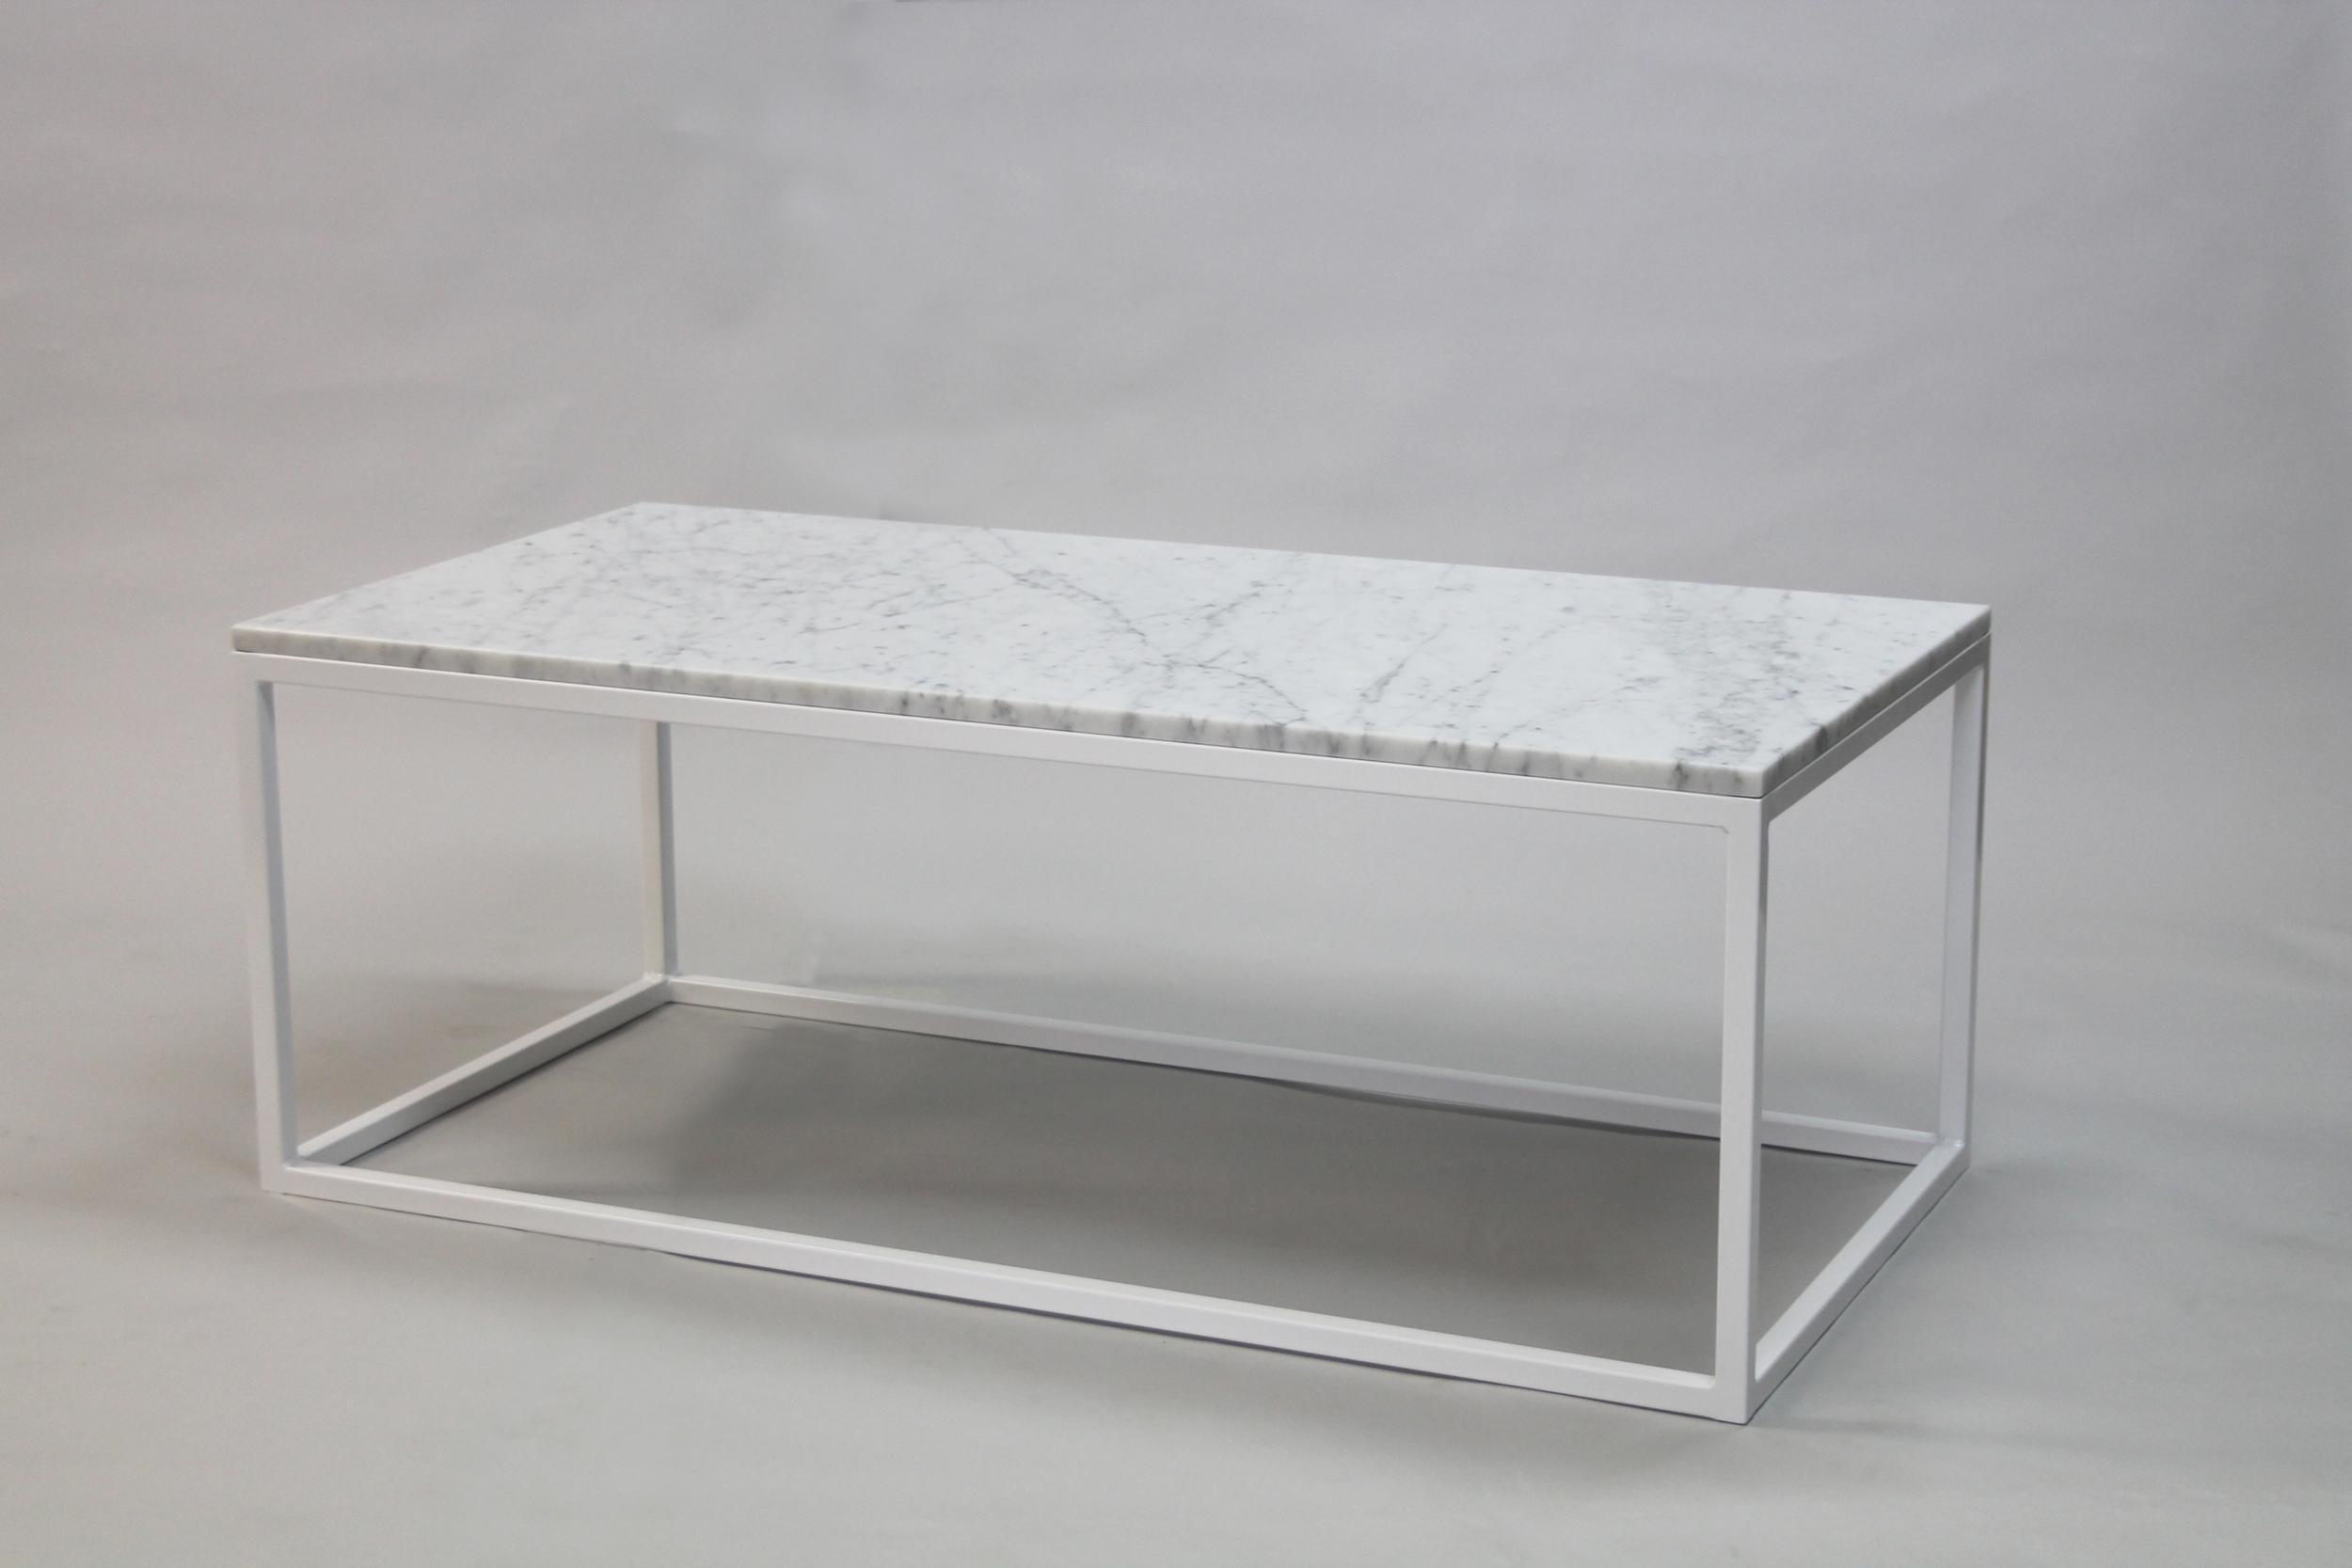 Marmorbord, vit - 120x60 x  45  cm, vitt underrede kub  Pris 6 500 :-  inkl frakt